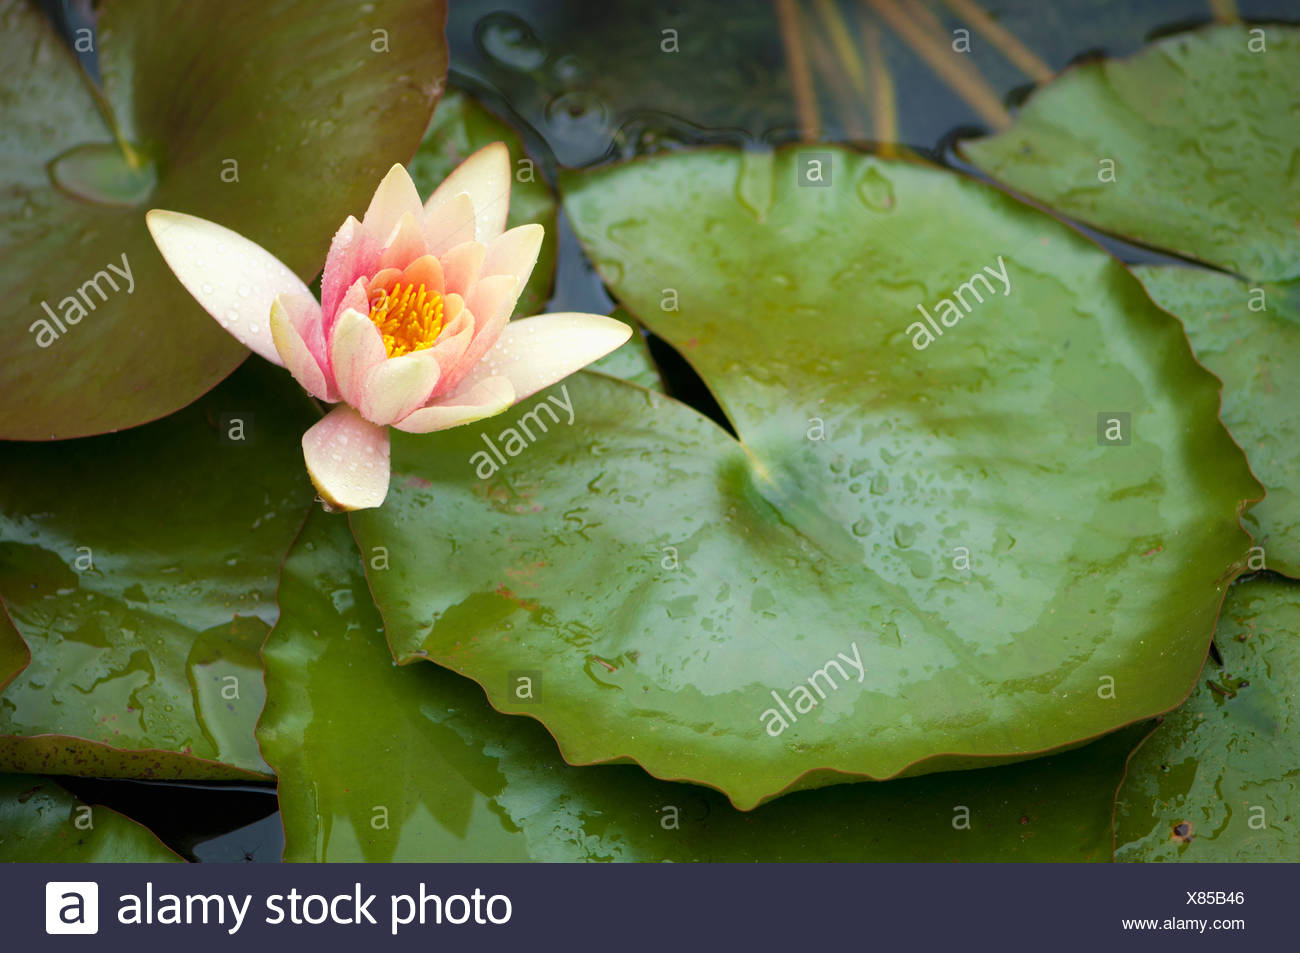 Pink lotus flowers stock photos pink lotus flowers stock images lotus flower in the pond berkeley california united states of america stock izmirmasajfo Gallery